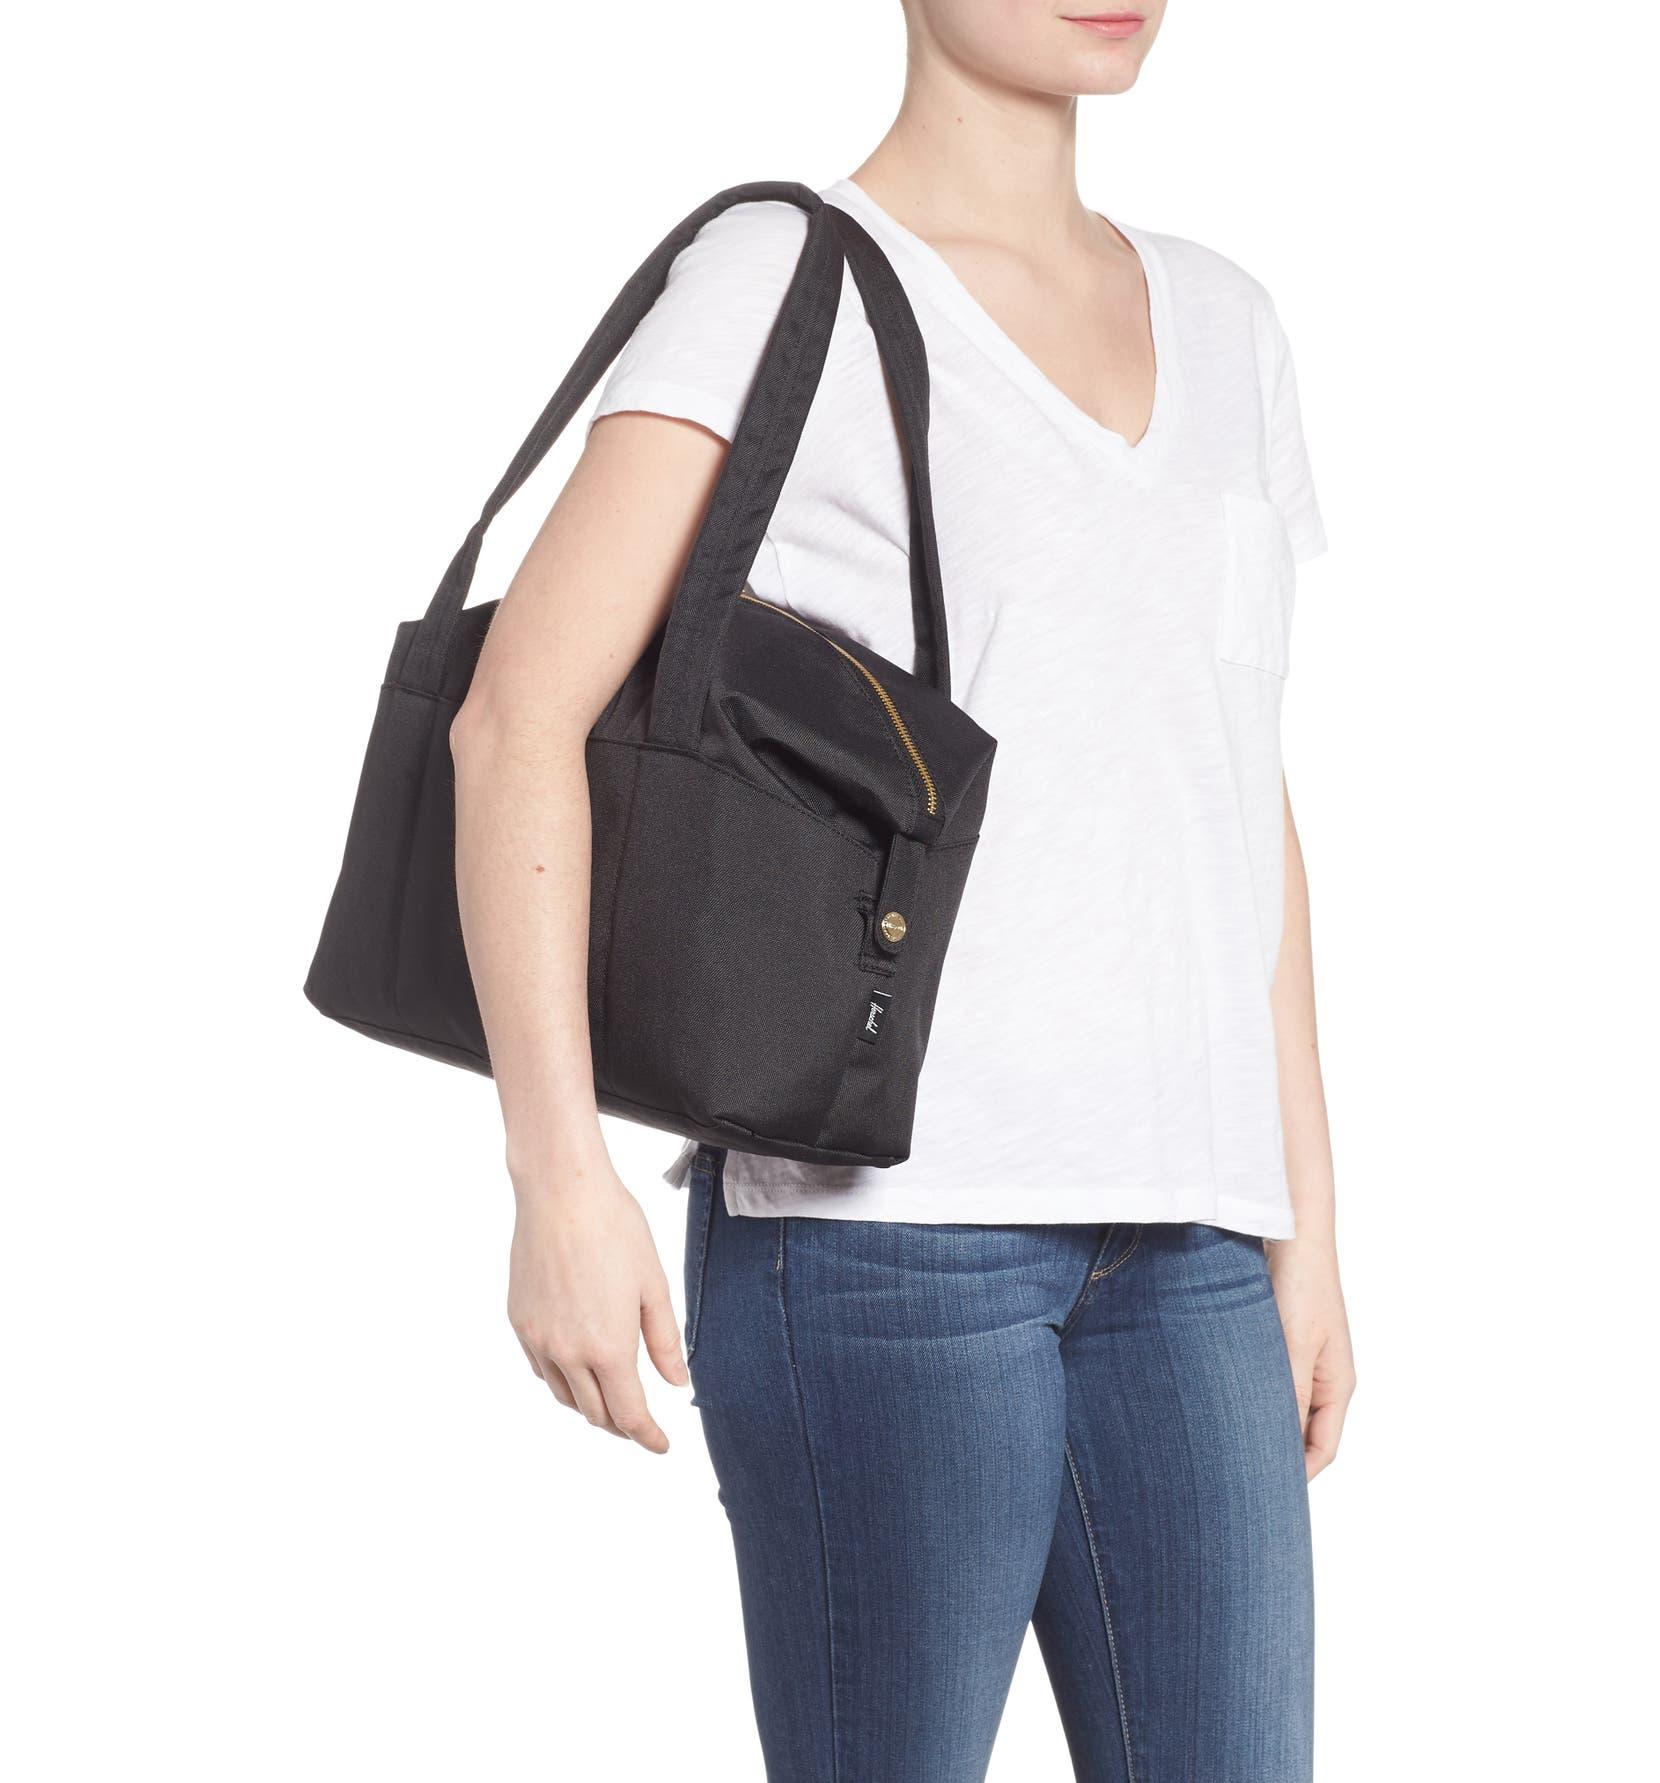 6a51028e54 Herschel Supply Co. Extra Small Strand Duffel Bag